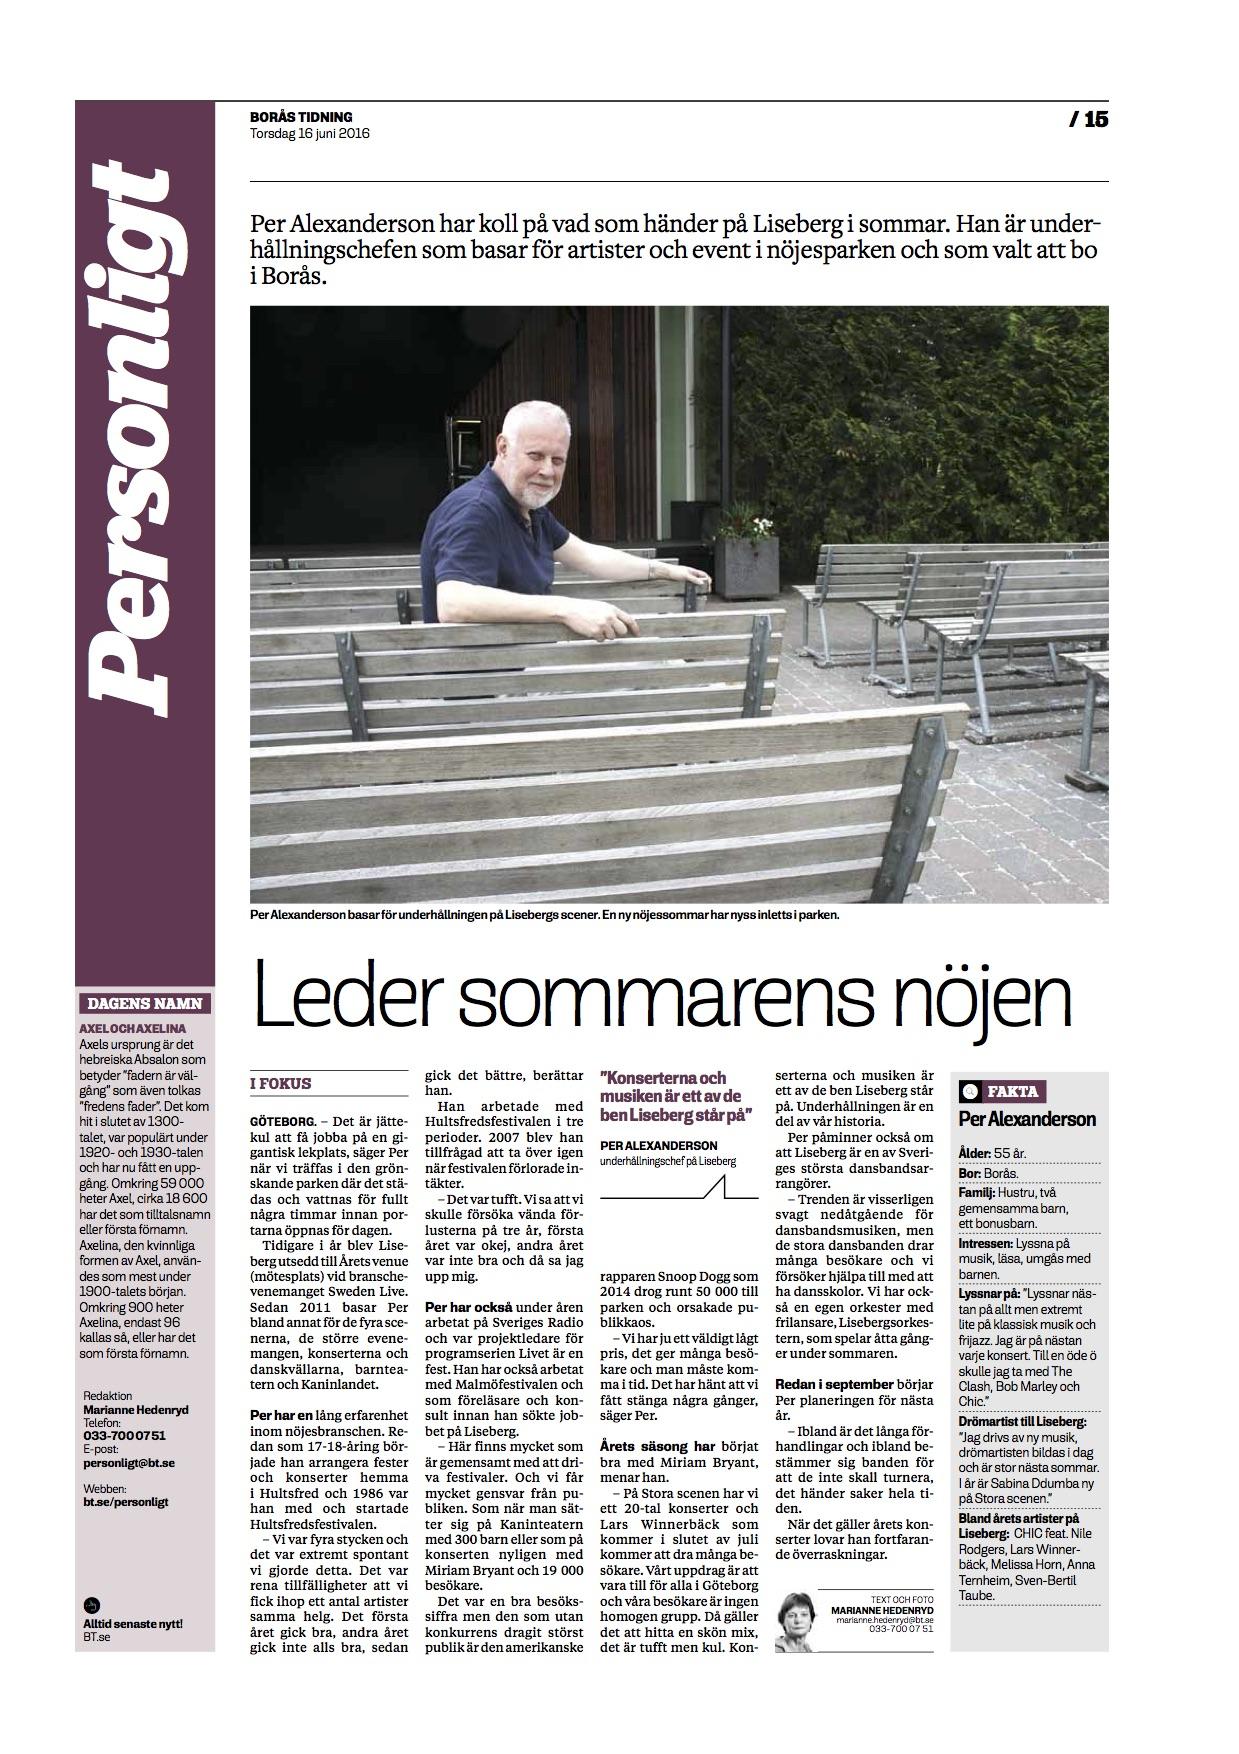 Borås tidning intervju - Per Alexanderson.jpg